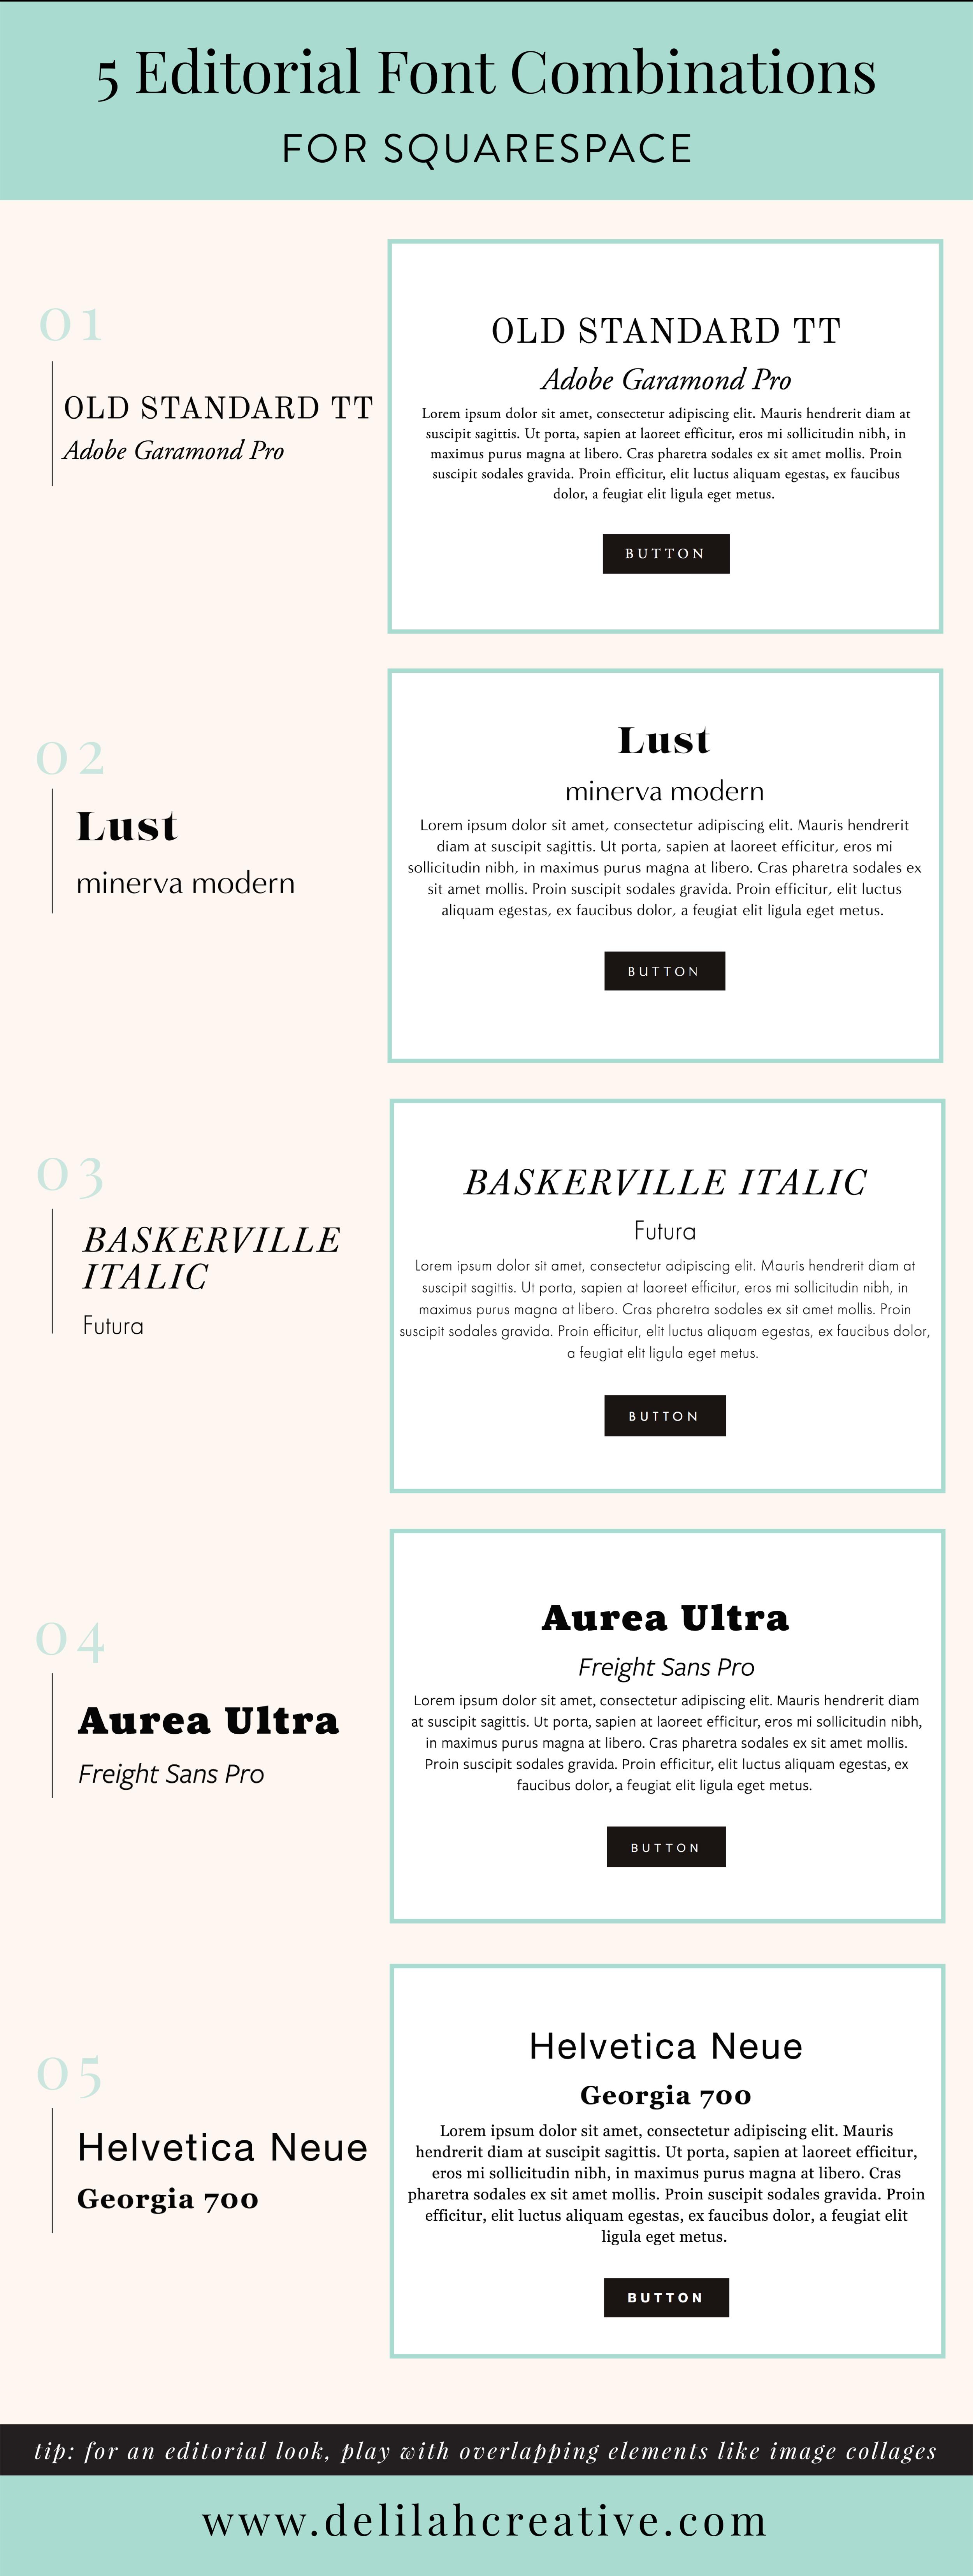 squarespace-editorial-font-combinations